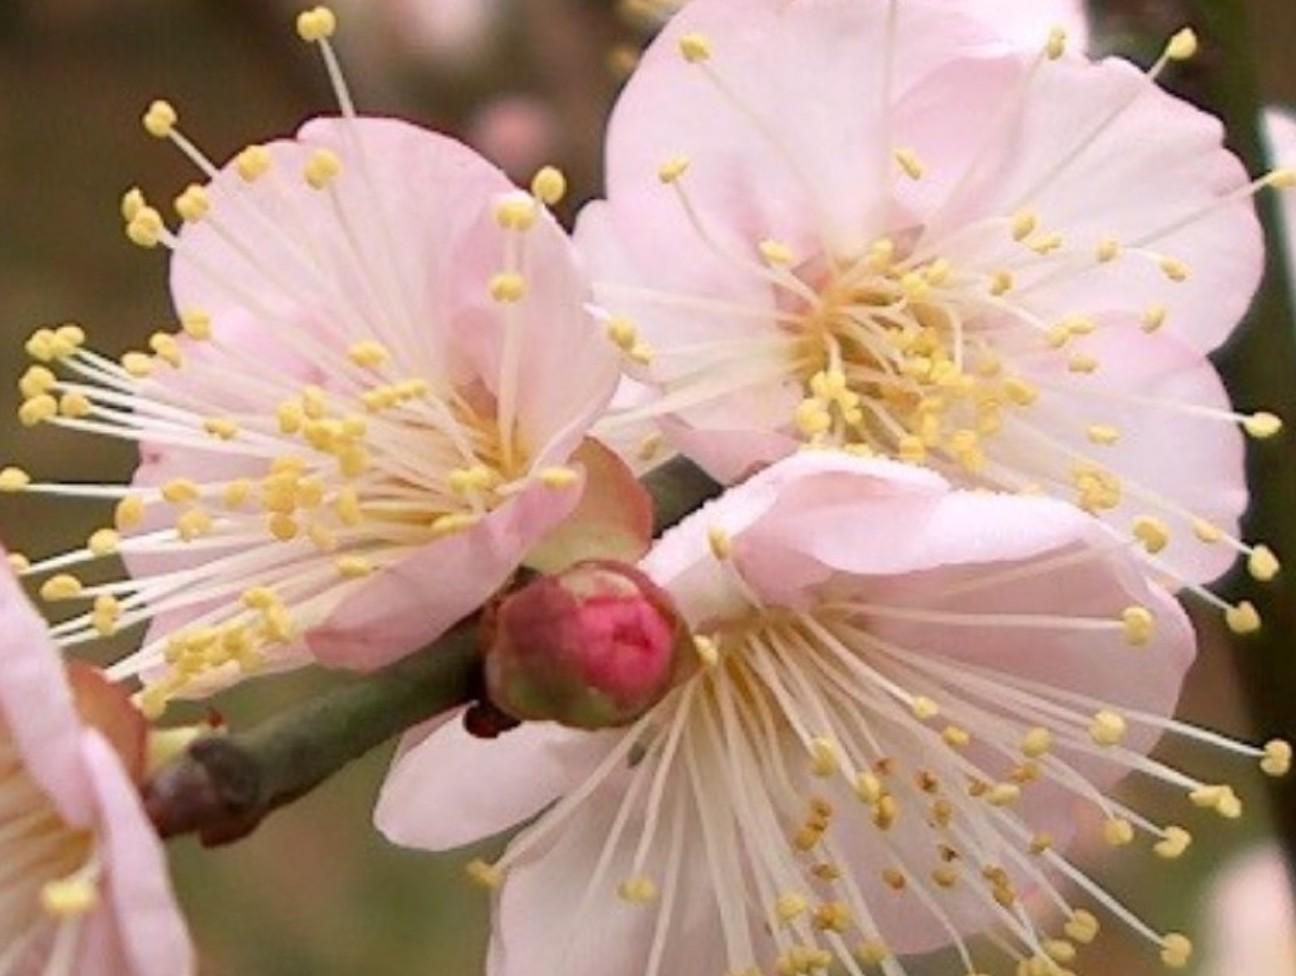 Prunus mume 'Trumpet'  / Prunus mume 'Trumpet'